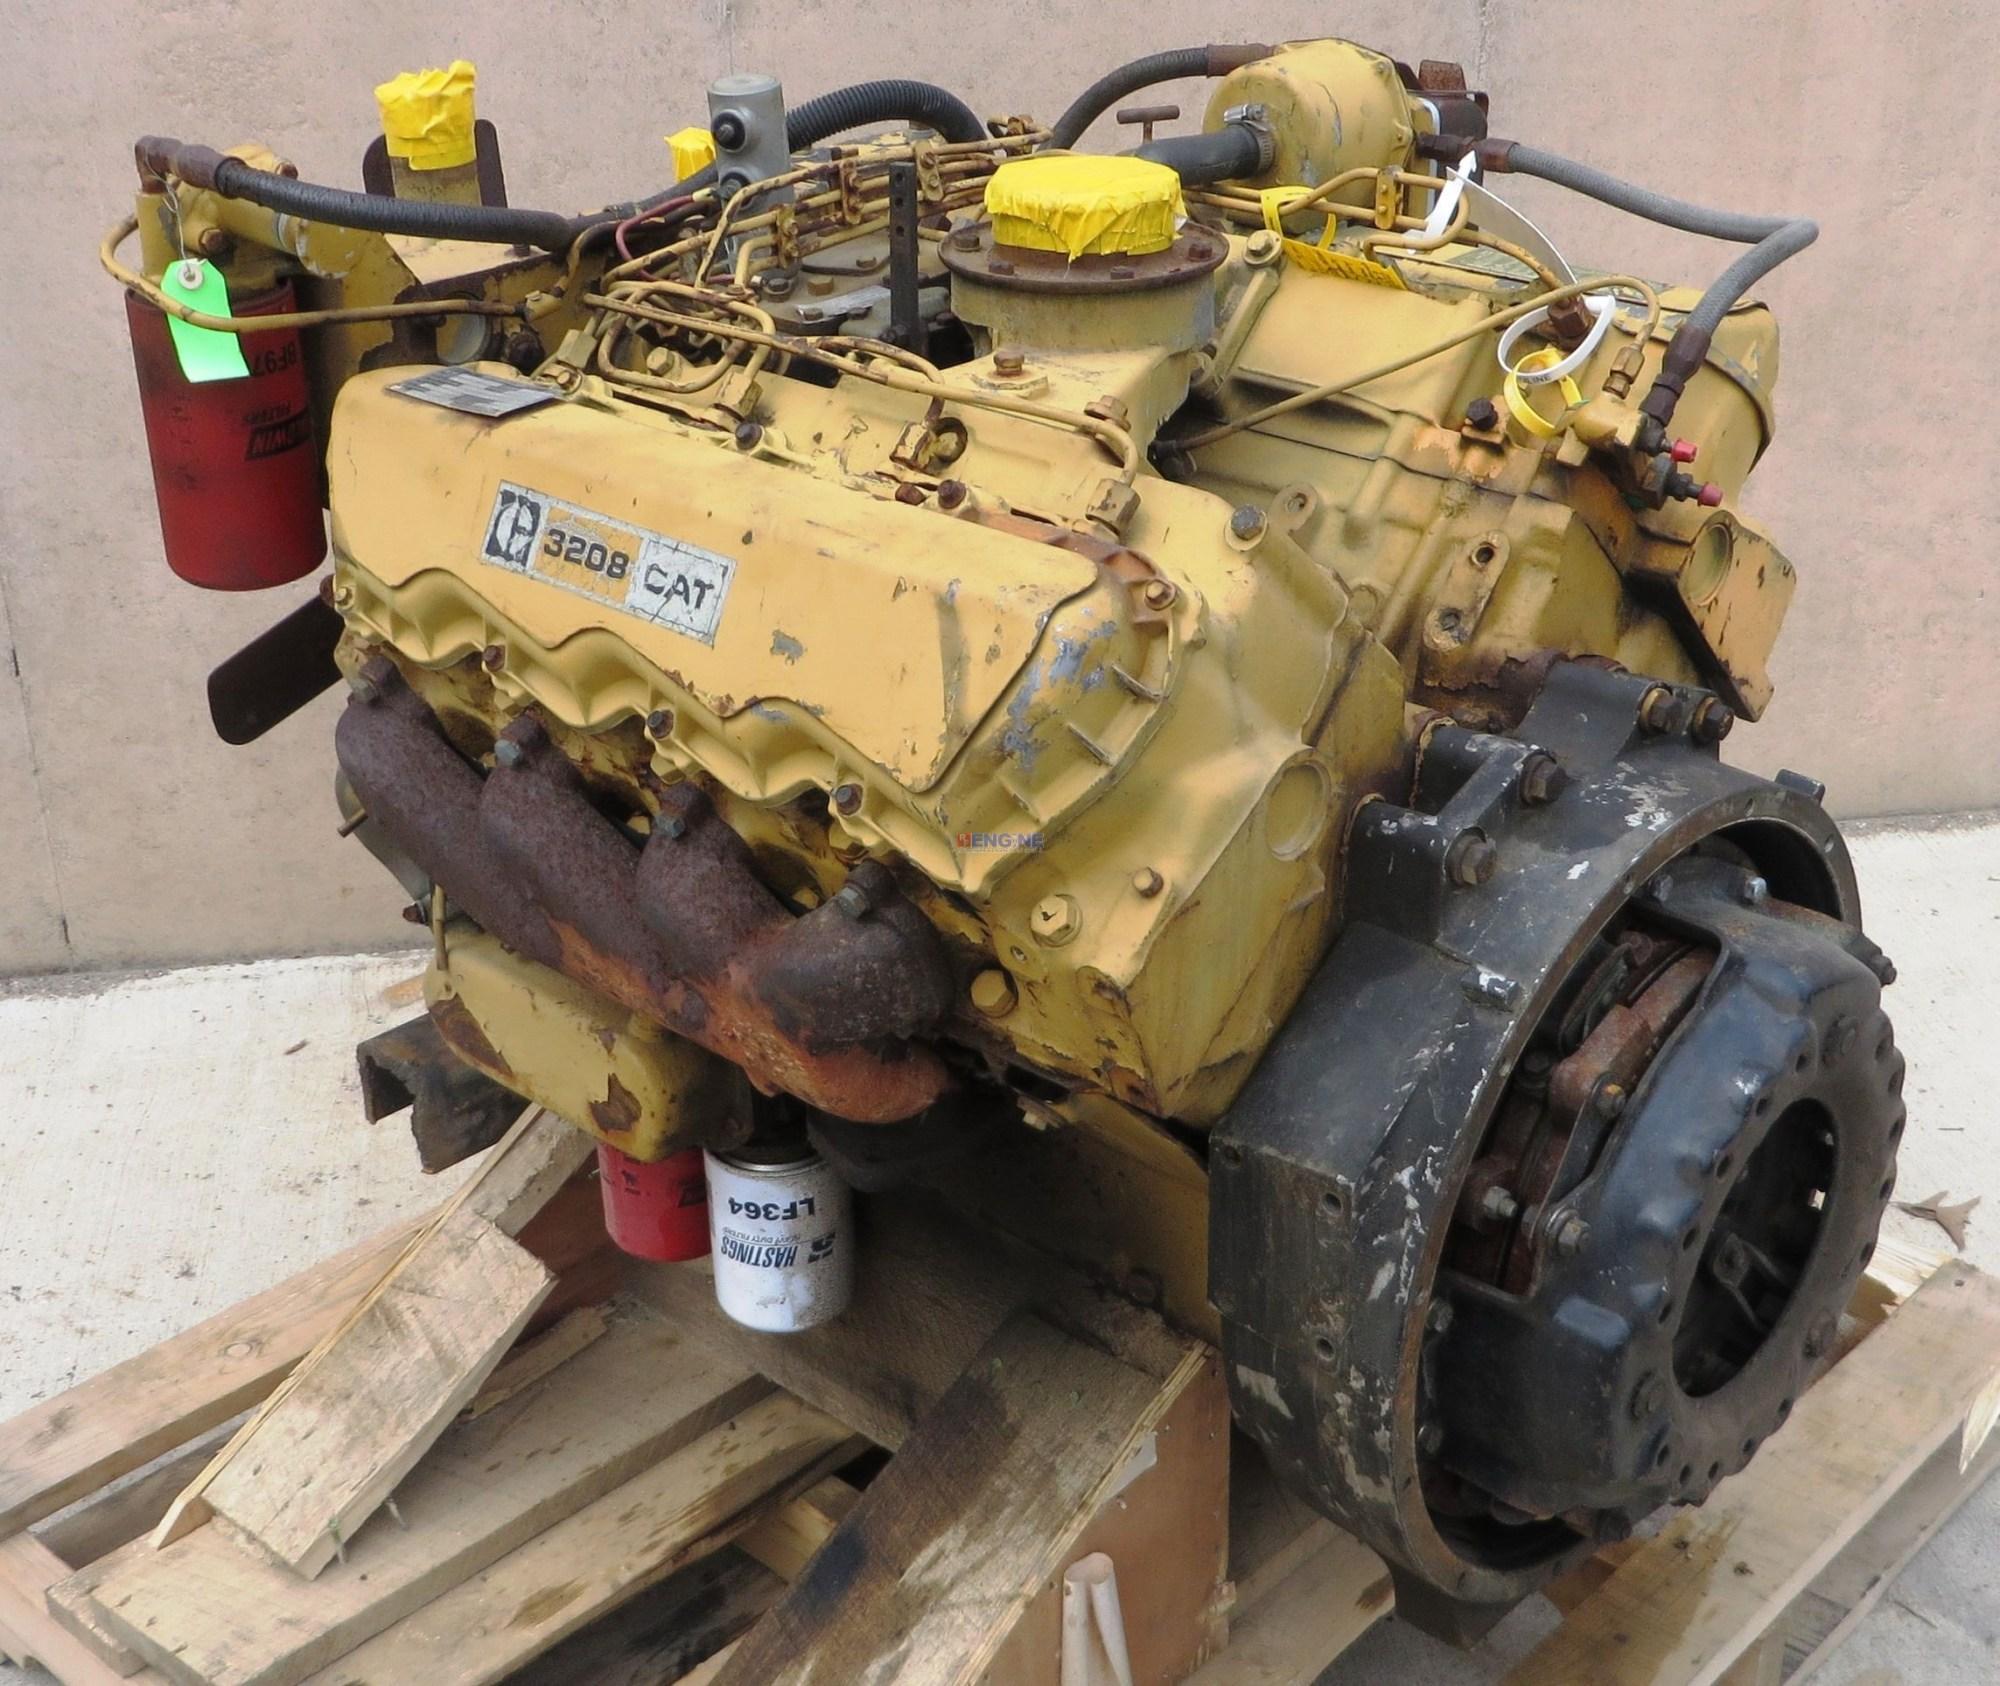 hight resolution of caterpillar 3208 engine good running caterpillar 3208 engine good running